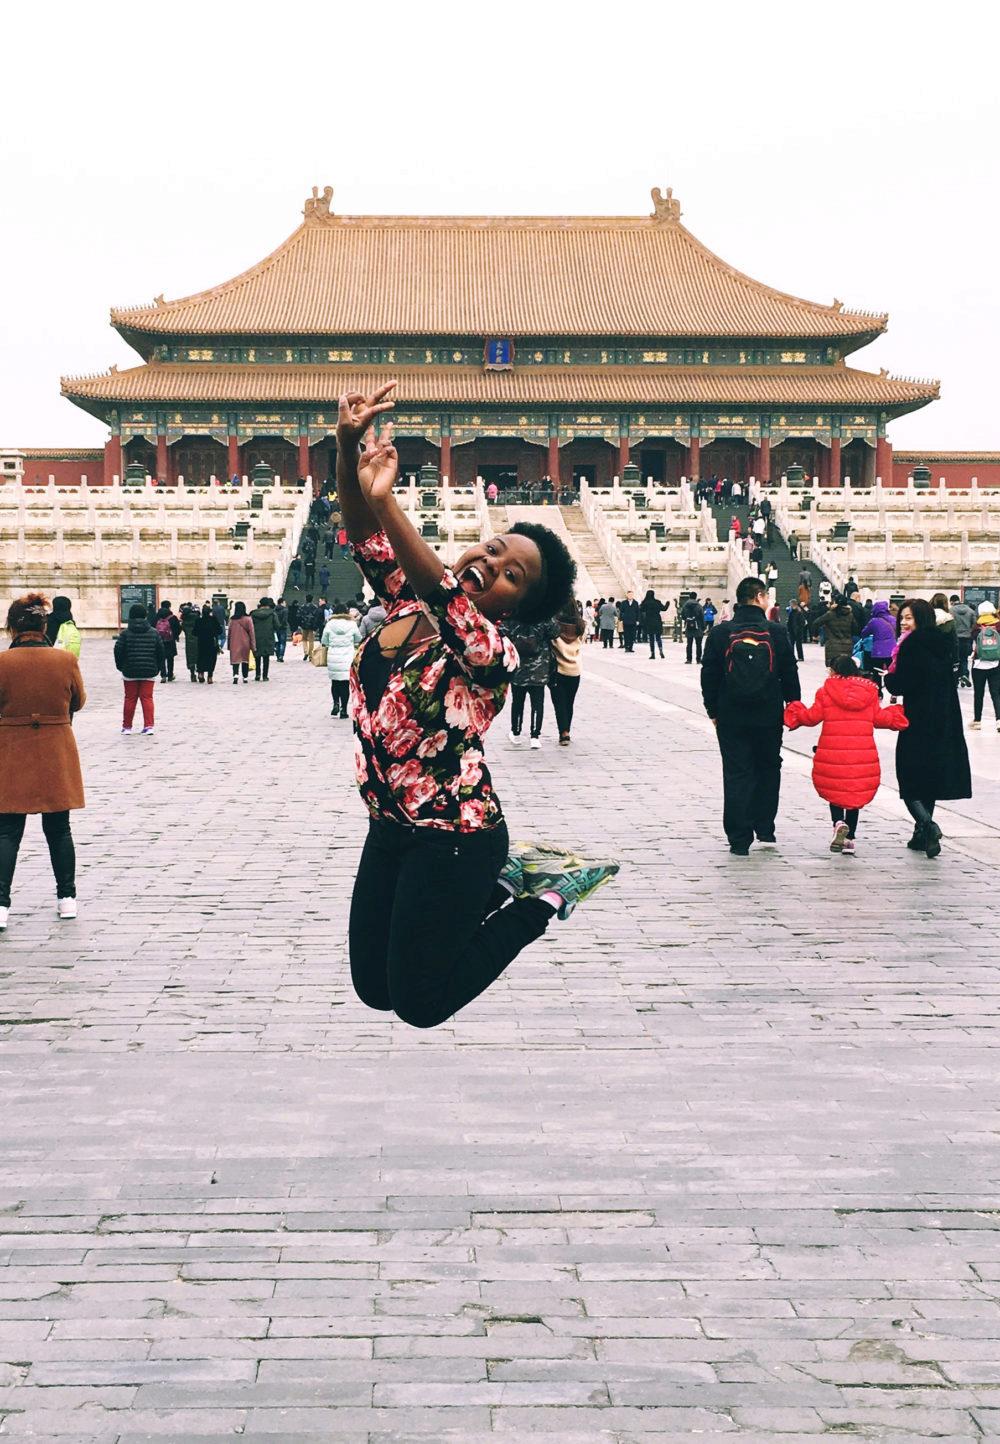 Junior Liliane Kevine Ikirezi, from Kigali, Rwanda, at the Forbidden City in Beijing.